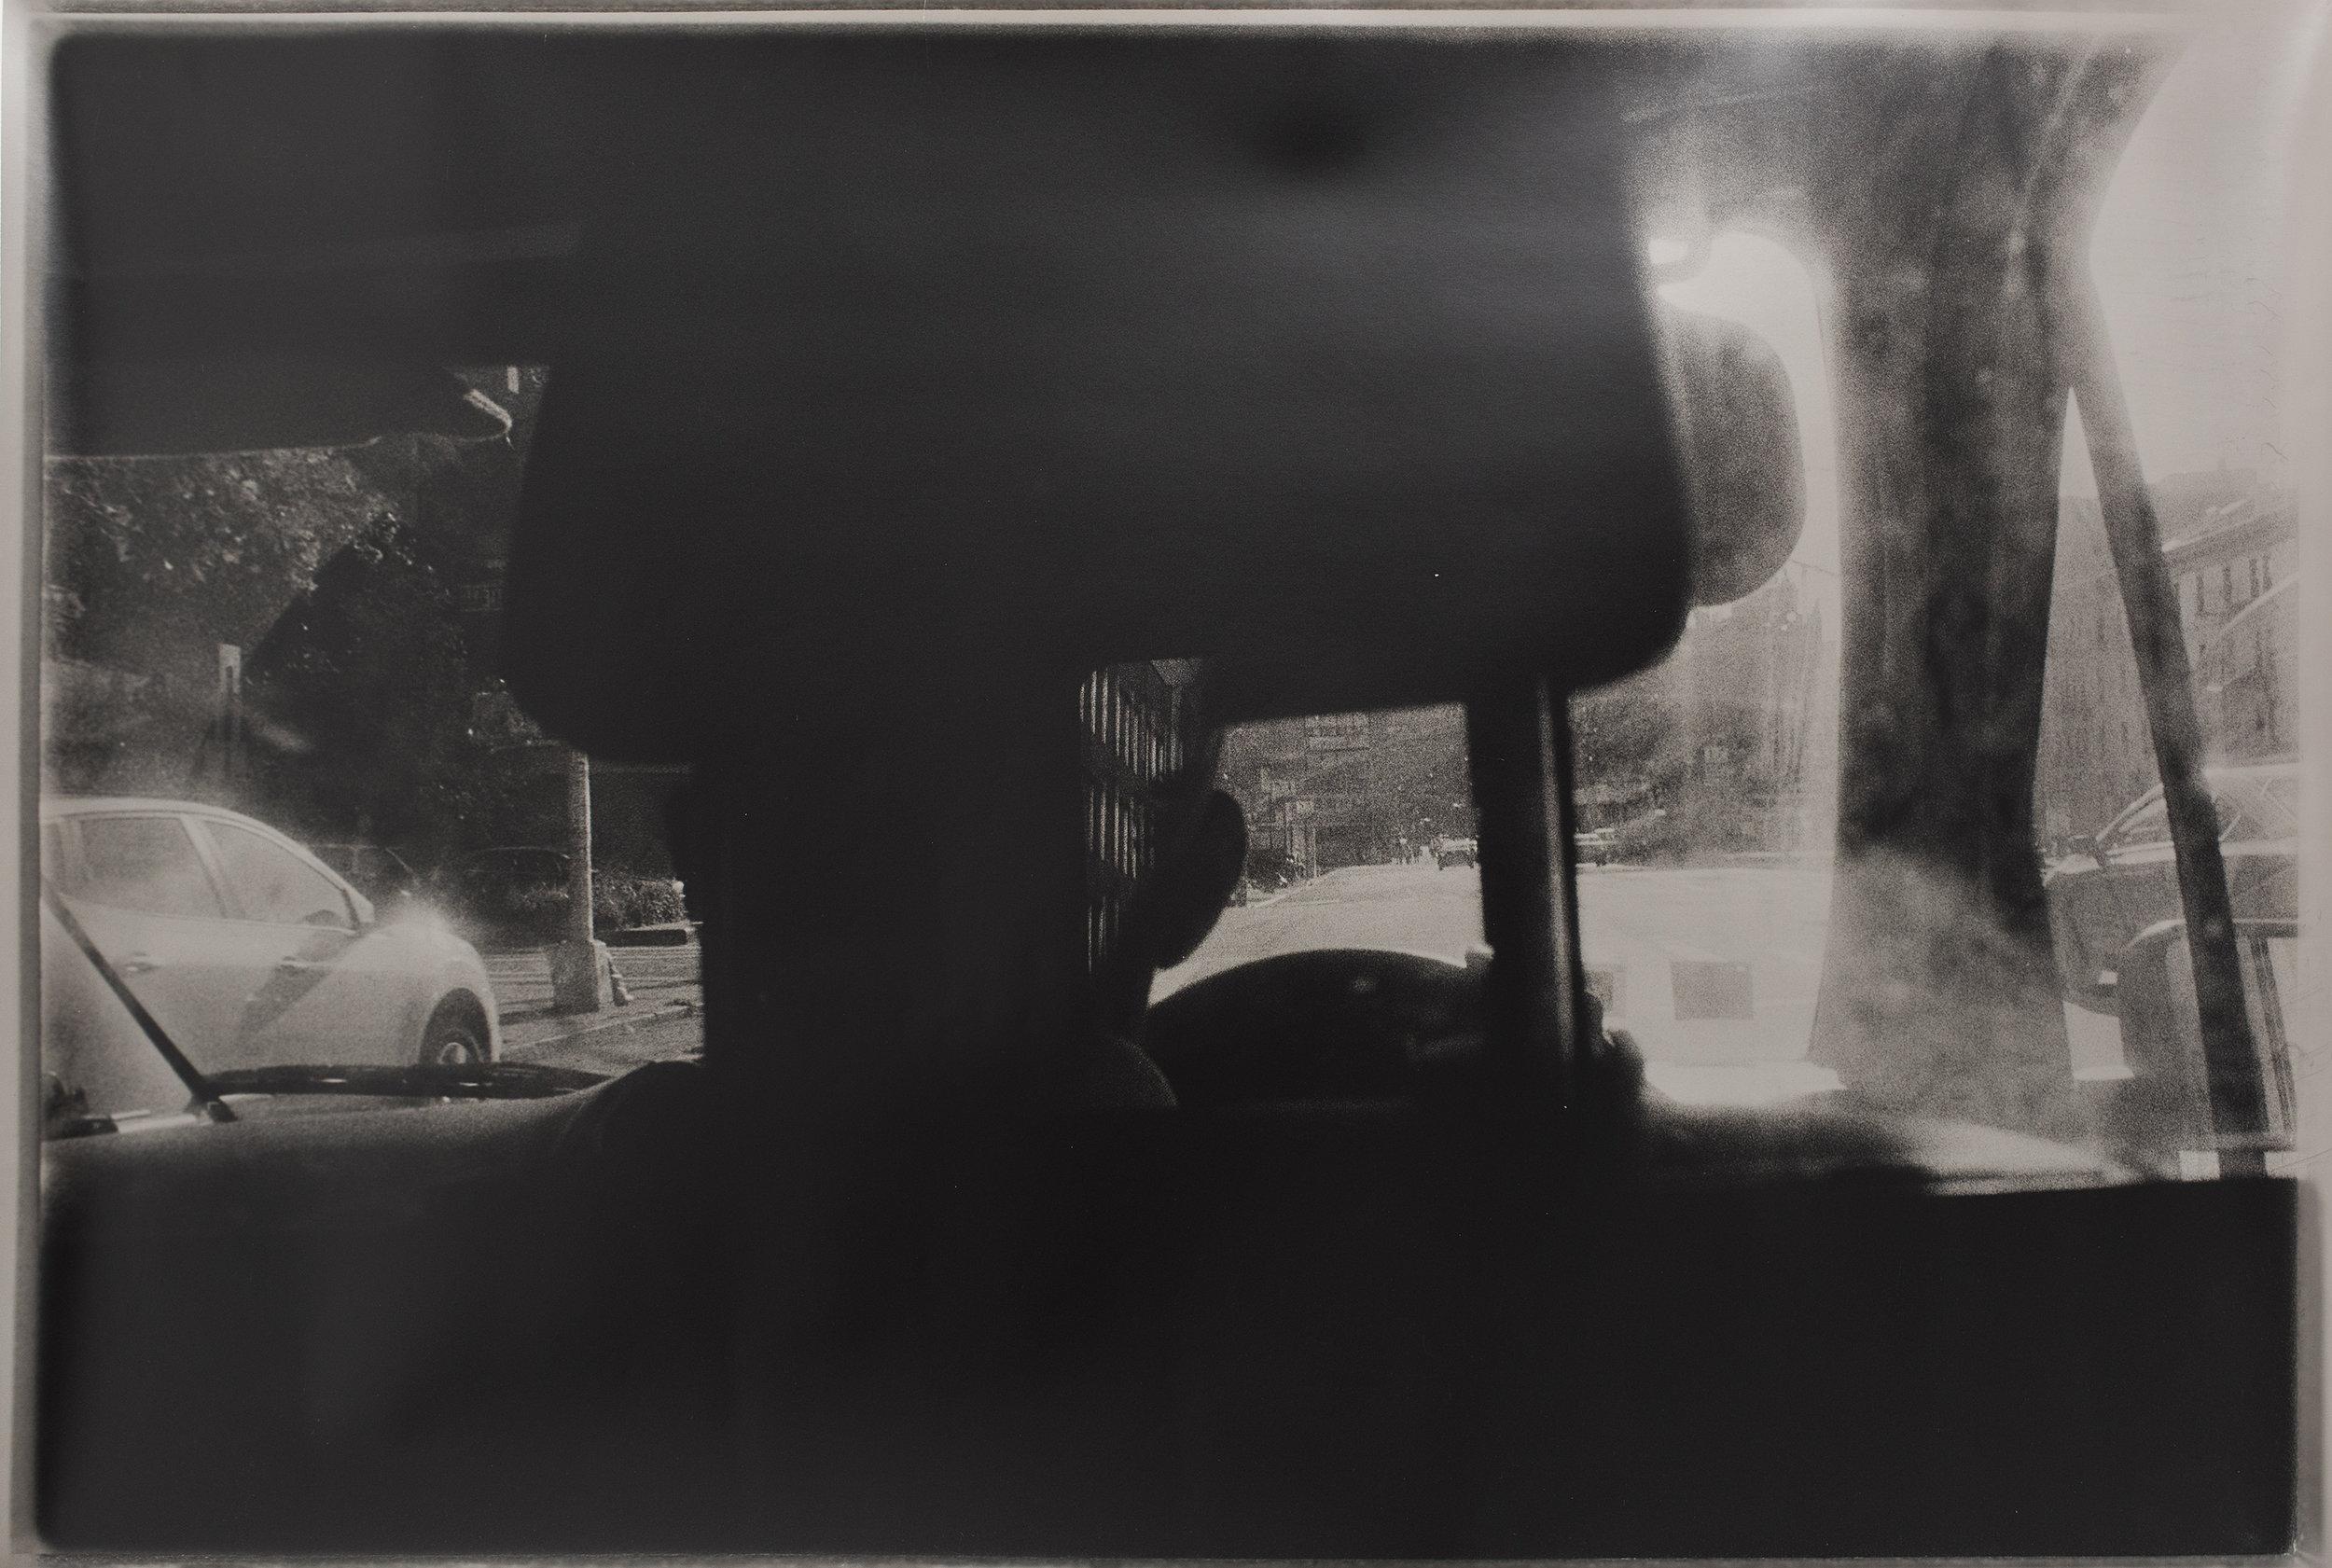 Navigation 1   hand printed silver gelatin fogged black and white photograph  160 x 80cm  2015